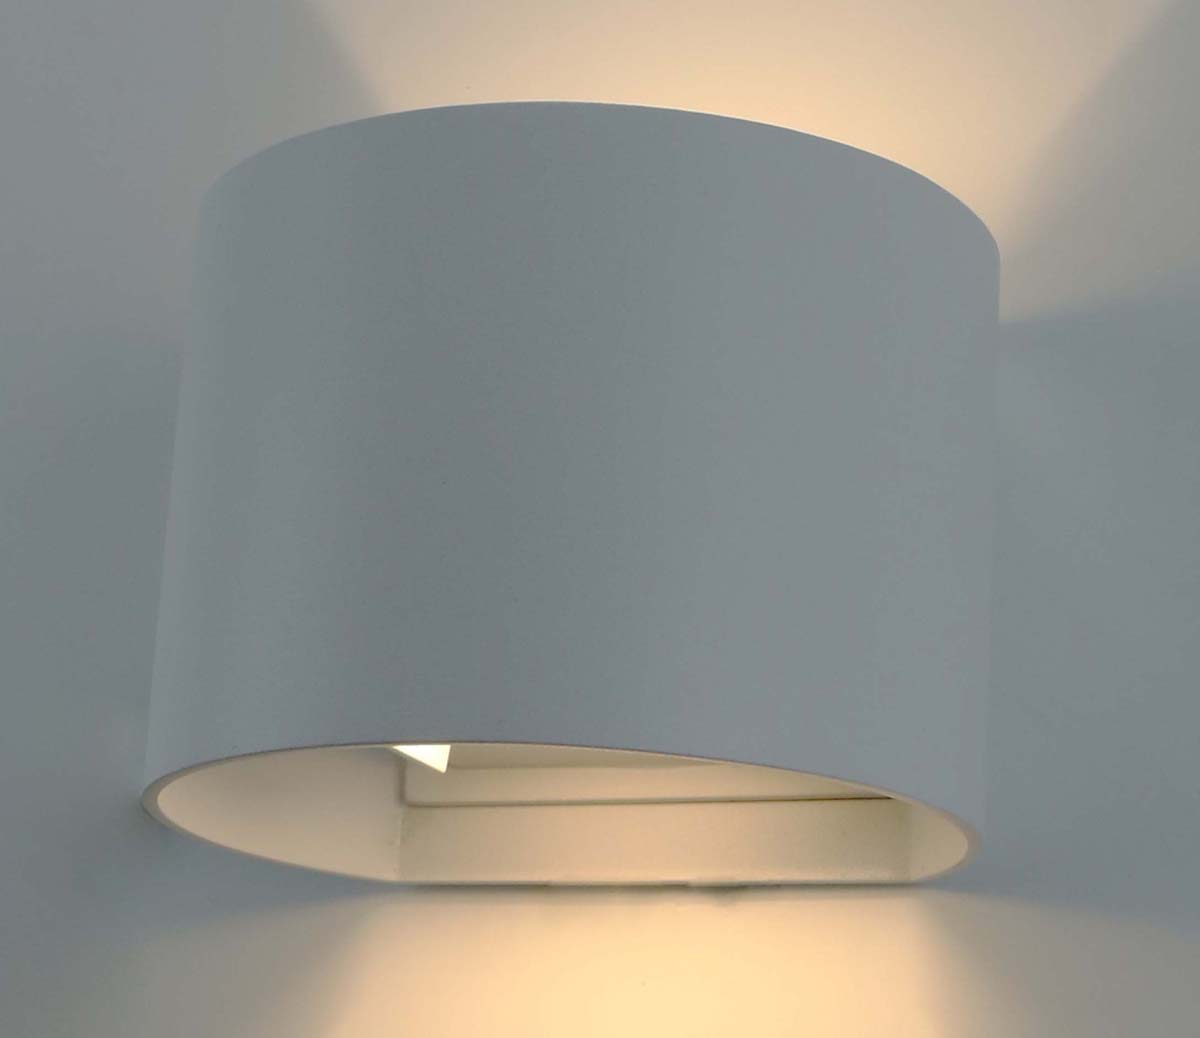 Светильник уличный Arte Lamp Rullo, цвет: белый, 1 х LED, 6 W. A1415AL-1WH with modern minimalist led hanging lamp bedside lamp button switch and creative bedroom wall lamp m